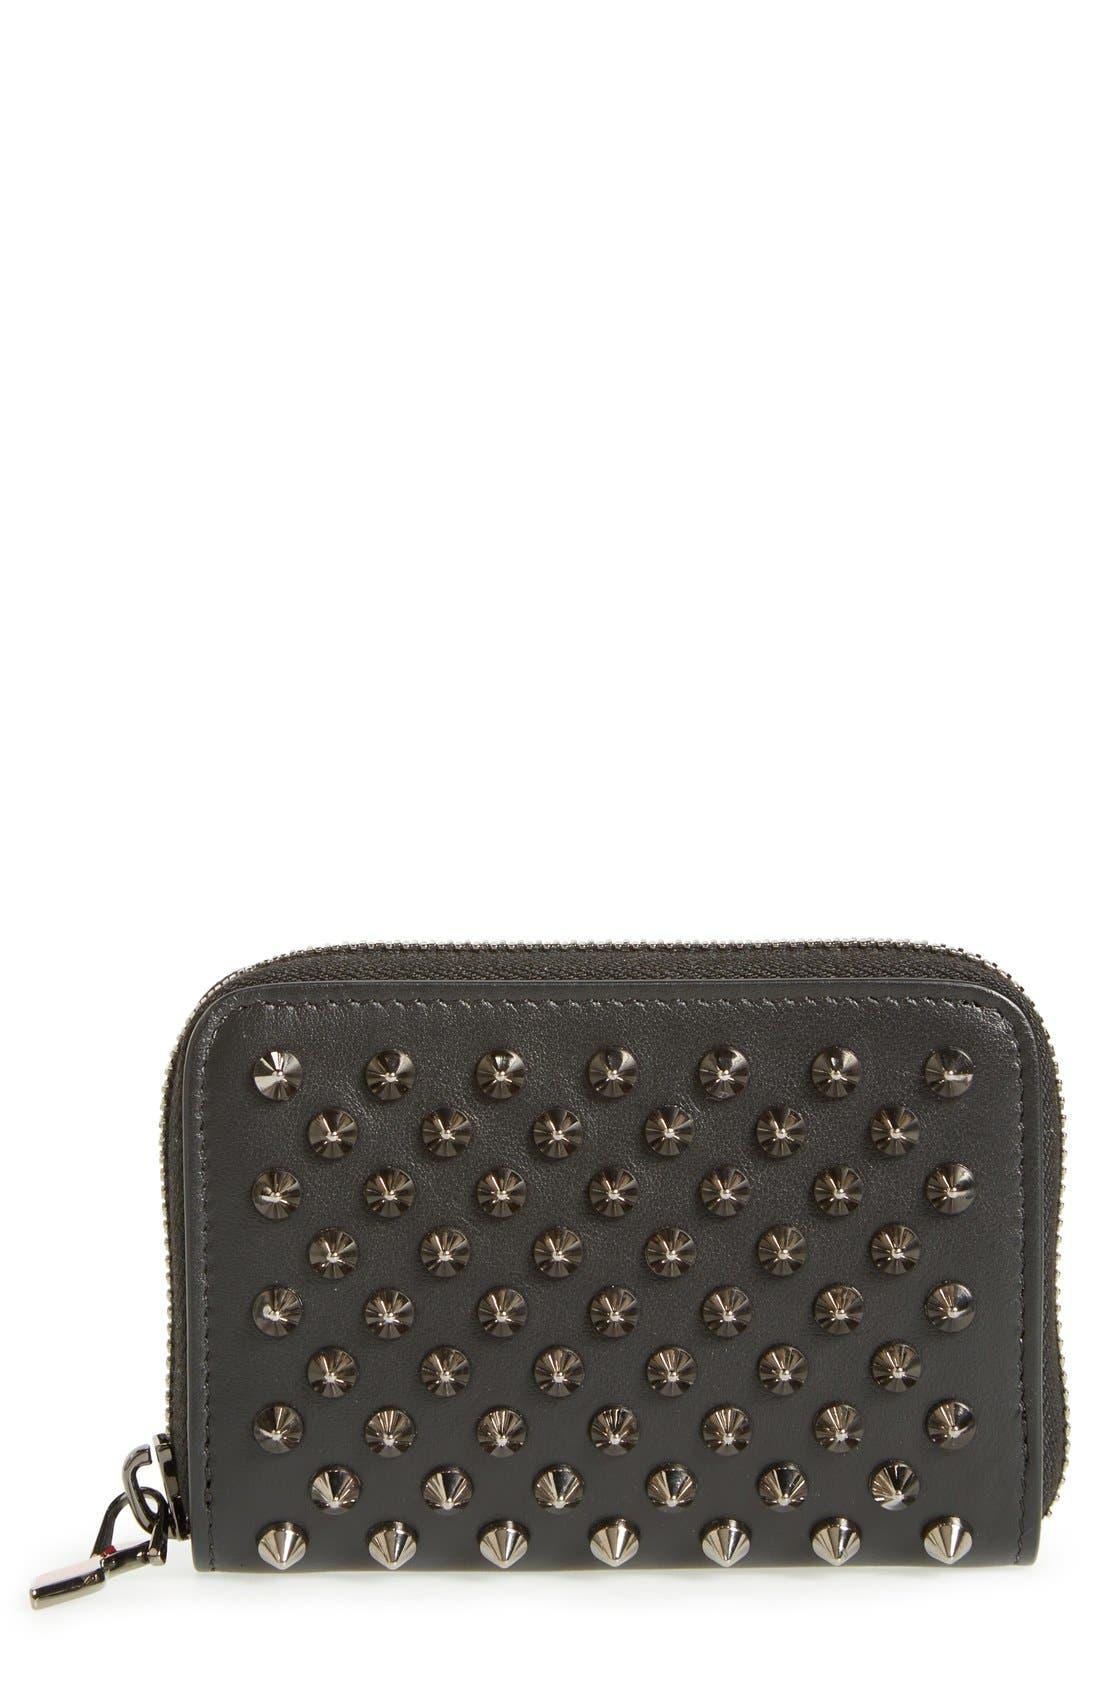 CHRISTIAN LOUBOUTIN Panettone Zip Around Calfskin Leather Wallet